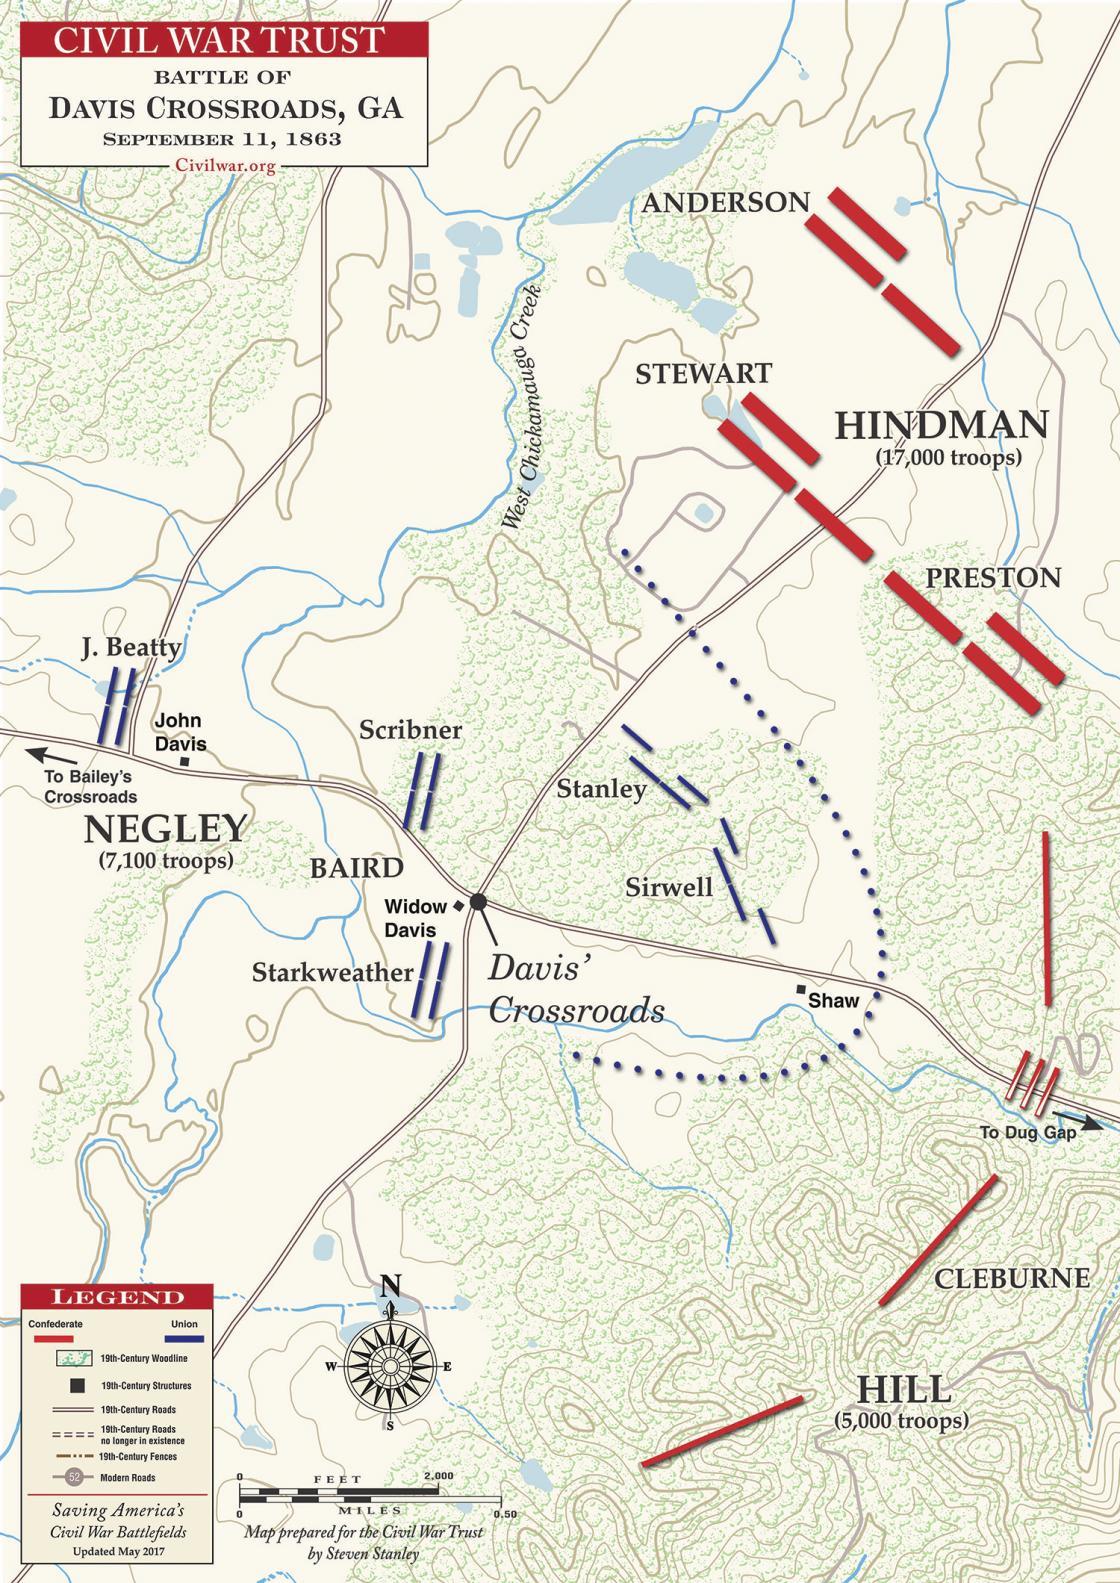 Davis Crossroads - September 11, 1863